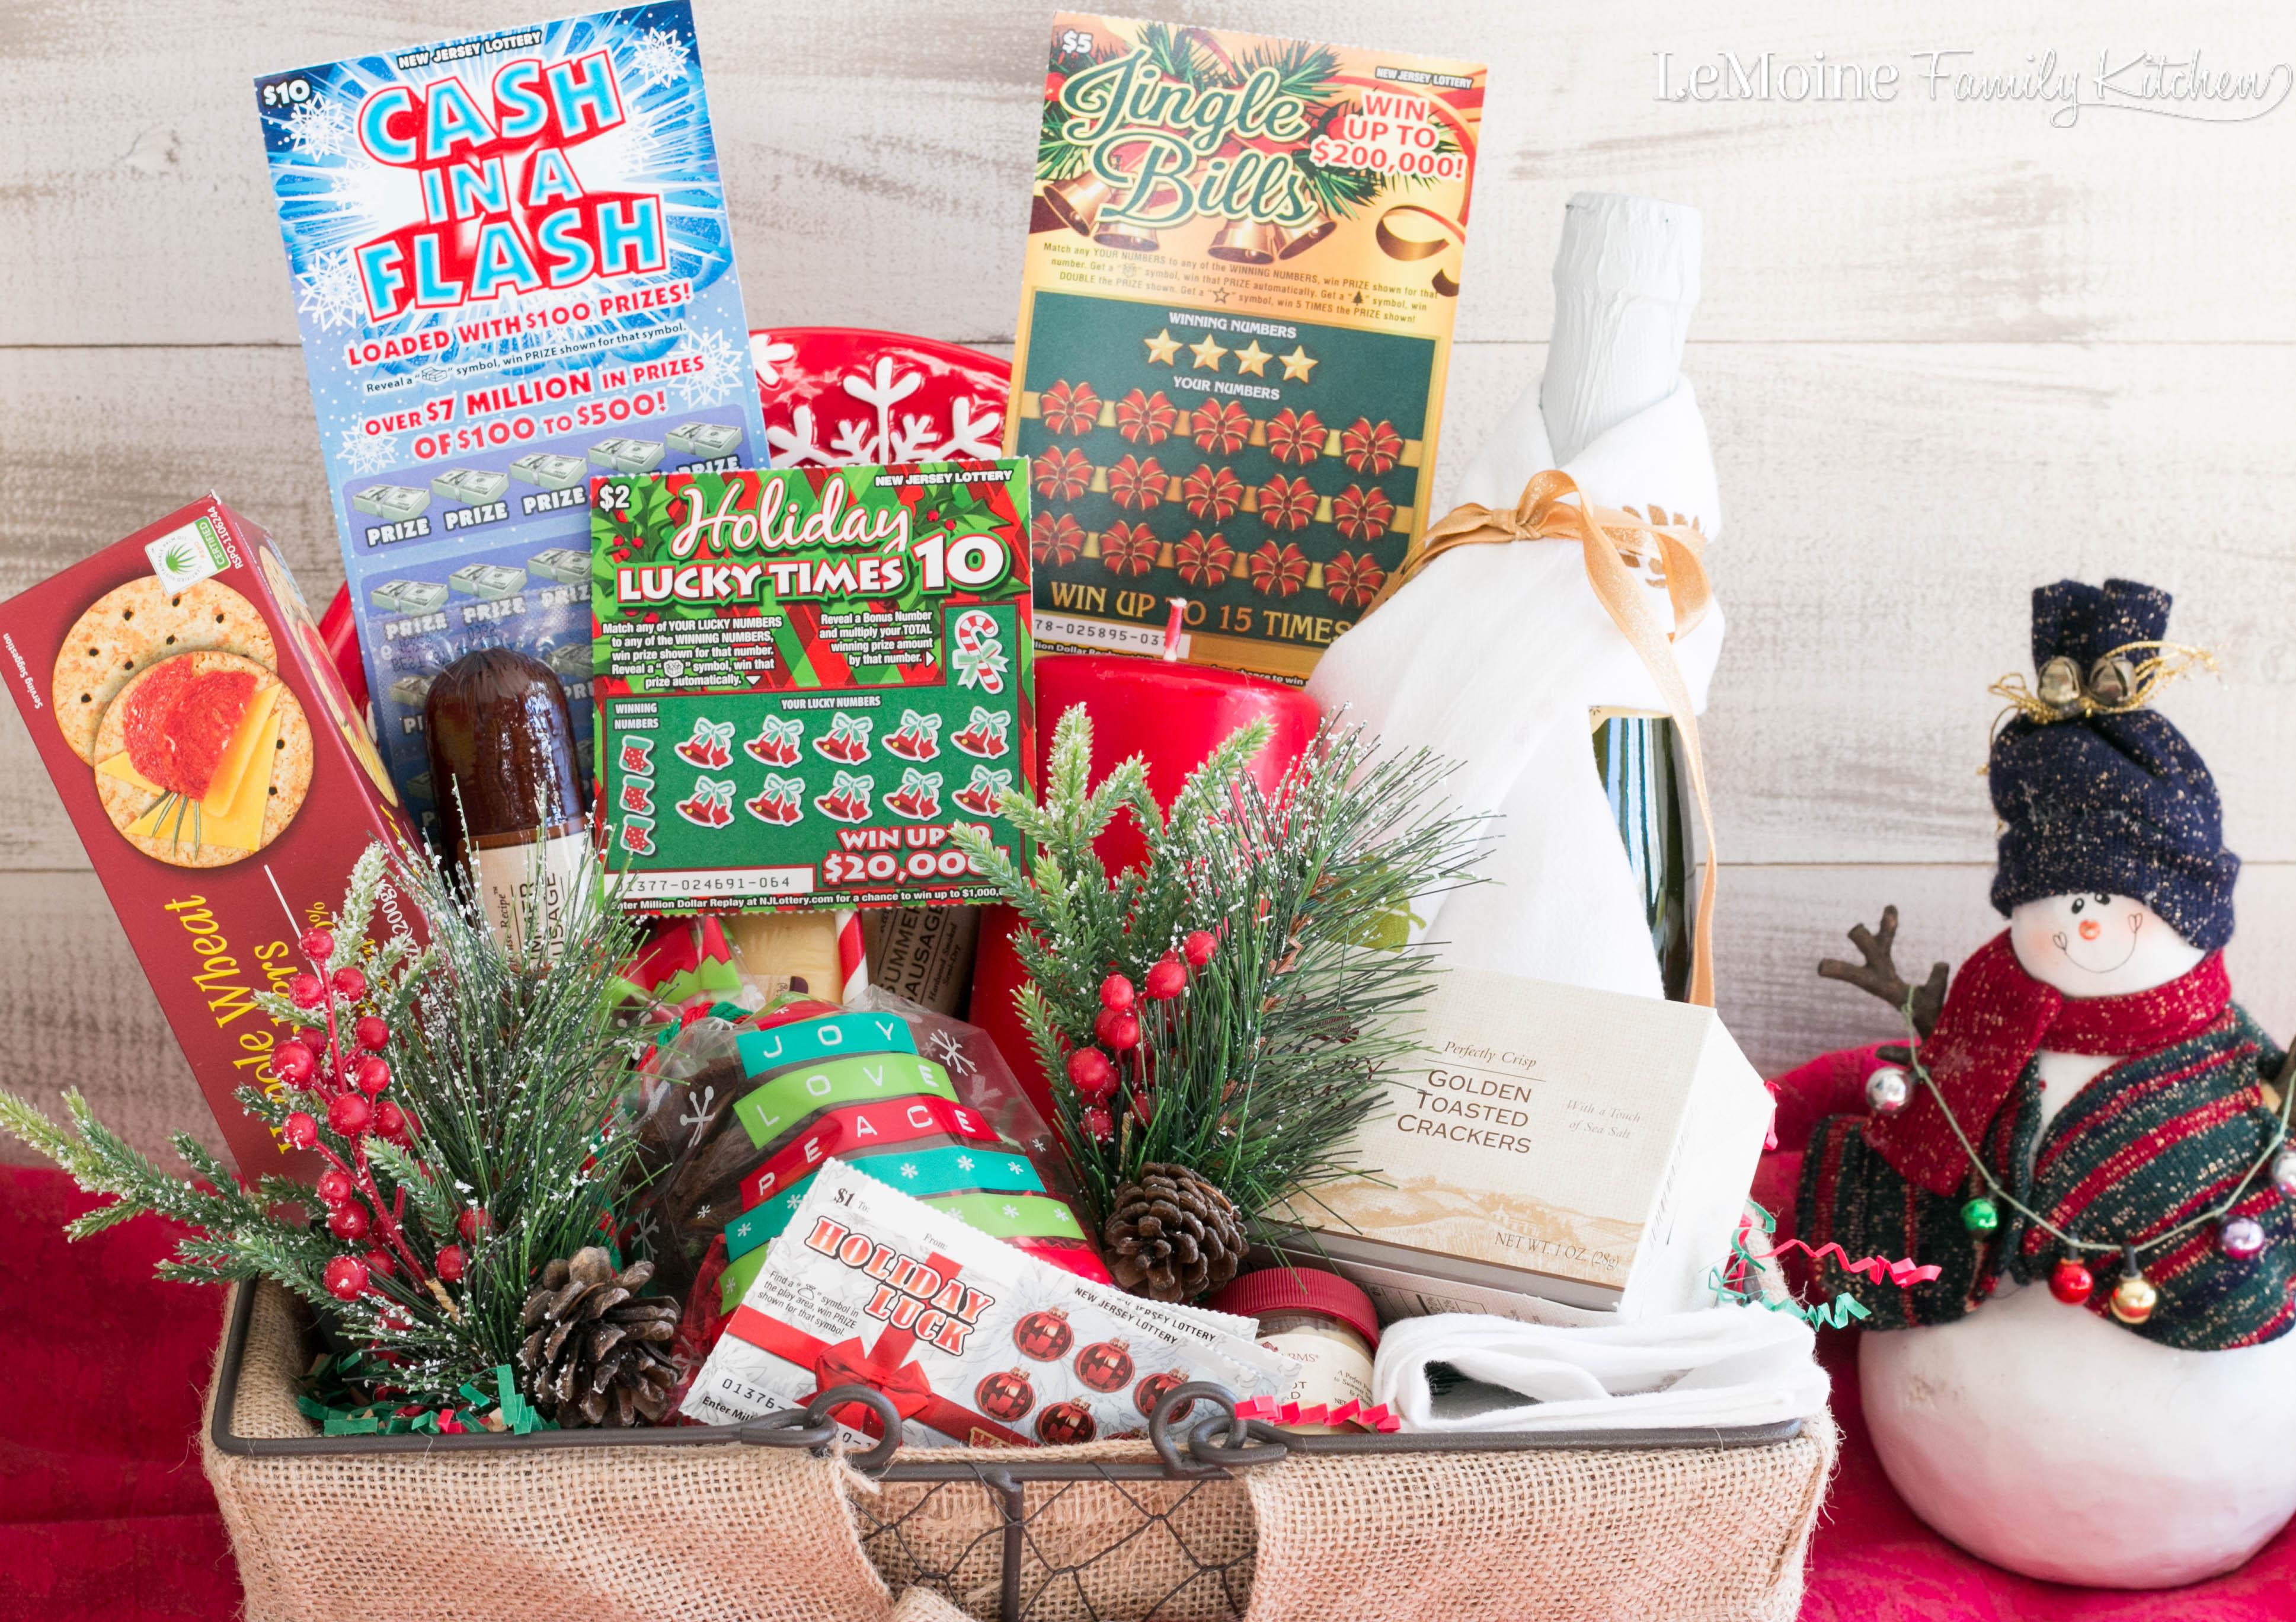 Food Lovers Gift Basket With Nj Lottery Lemoine Family